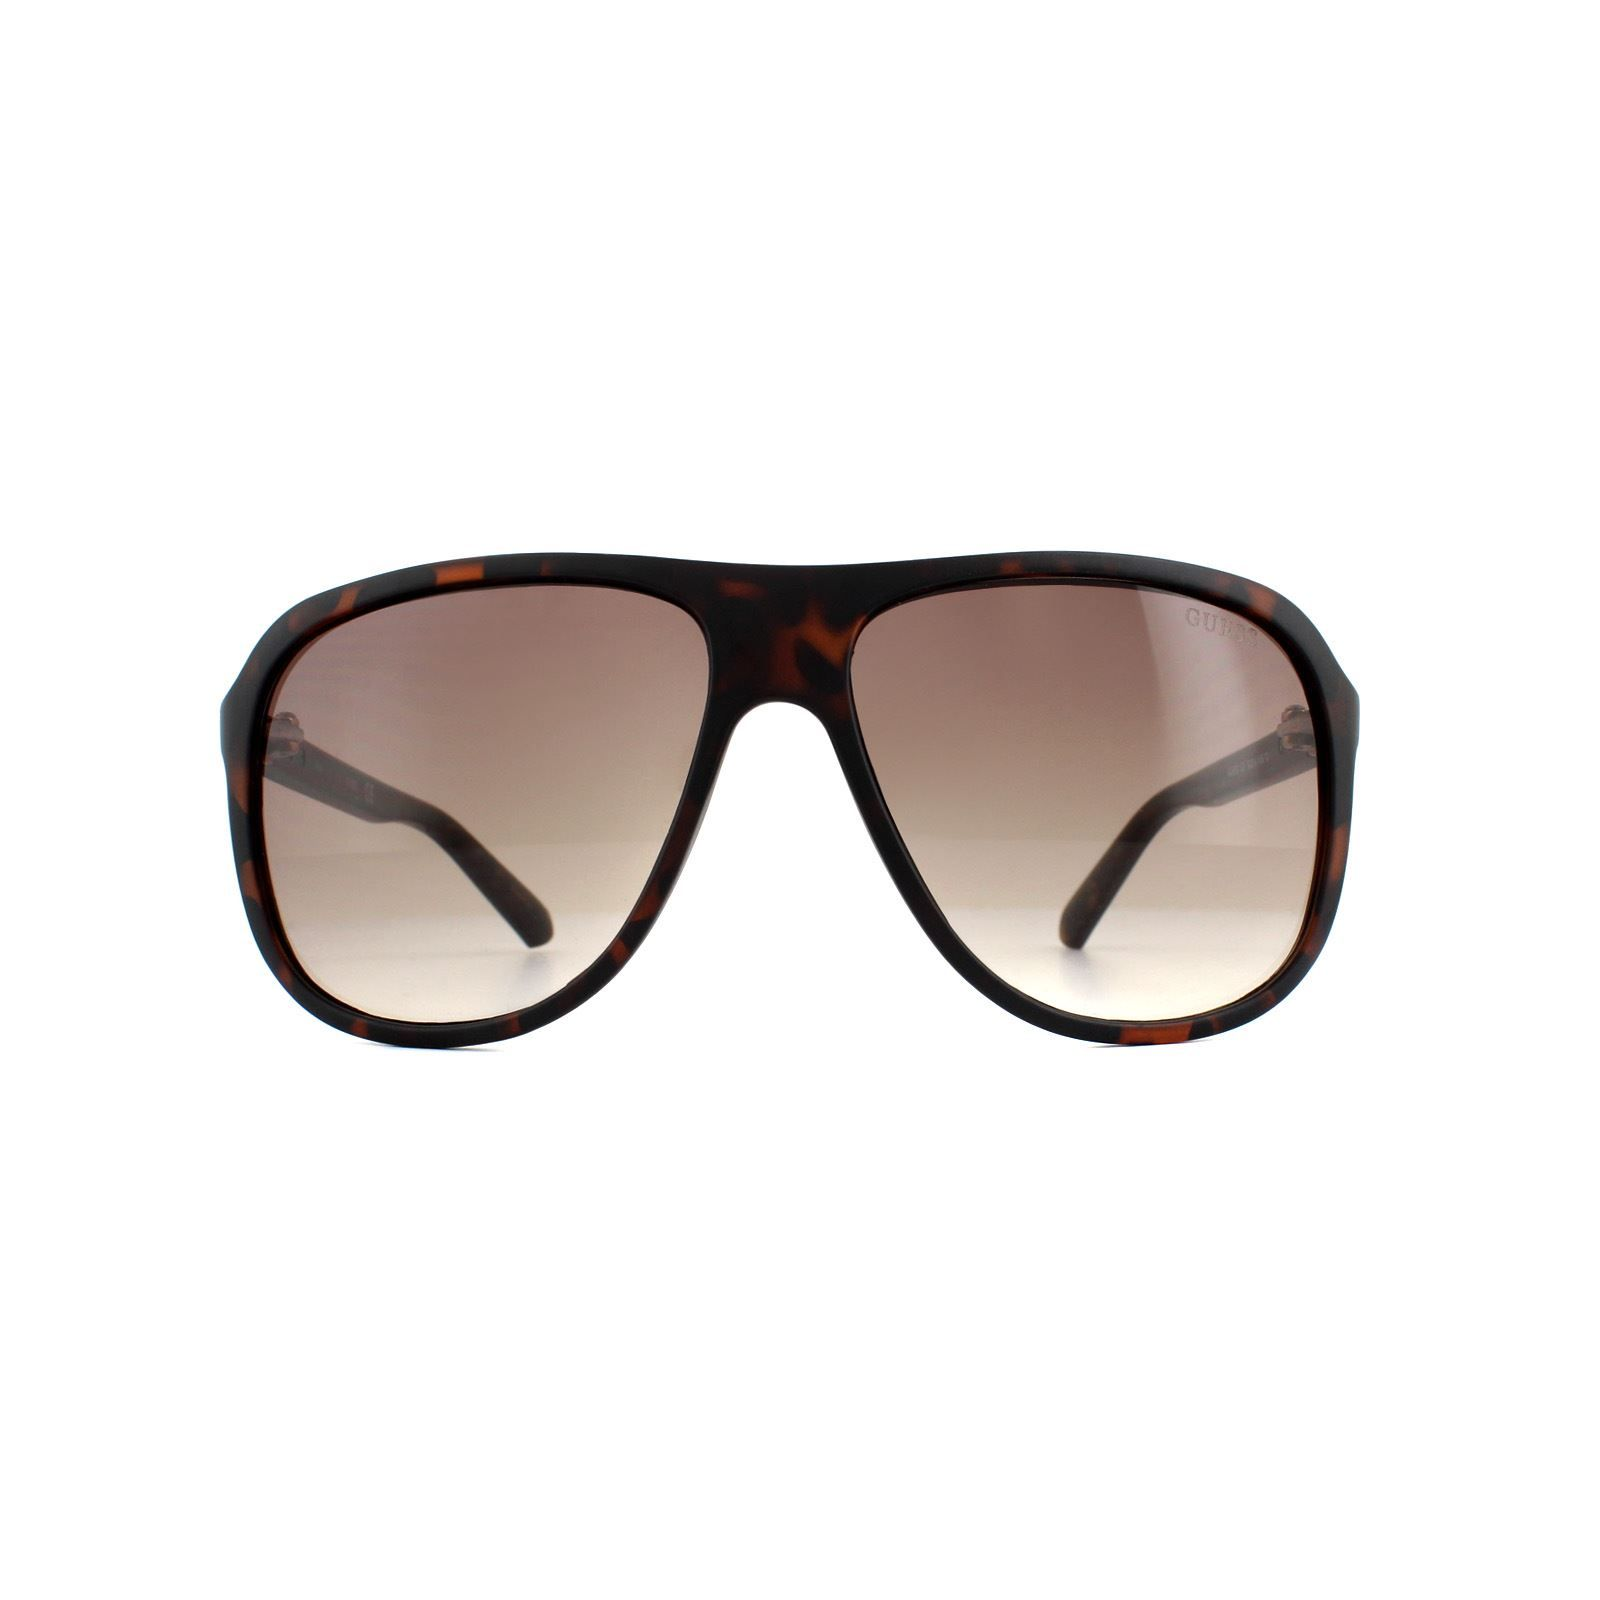 Guess Sunglasses GU6876 52F Tortoiseshell Brown Gradient